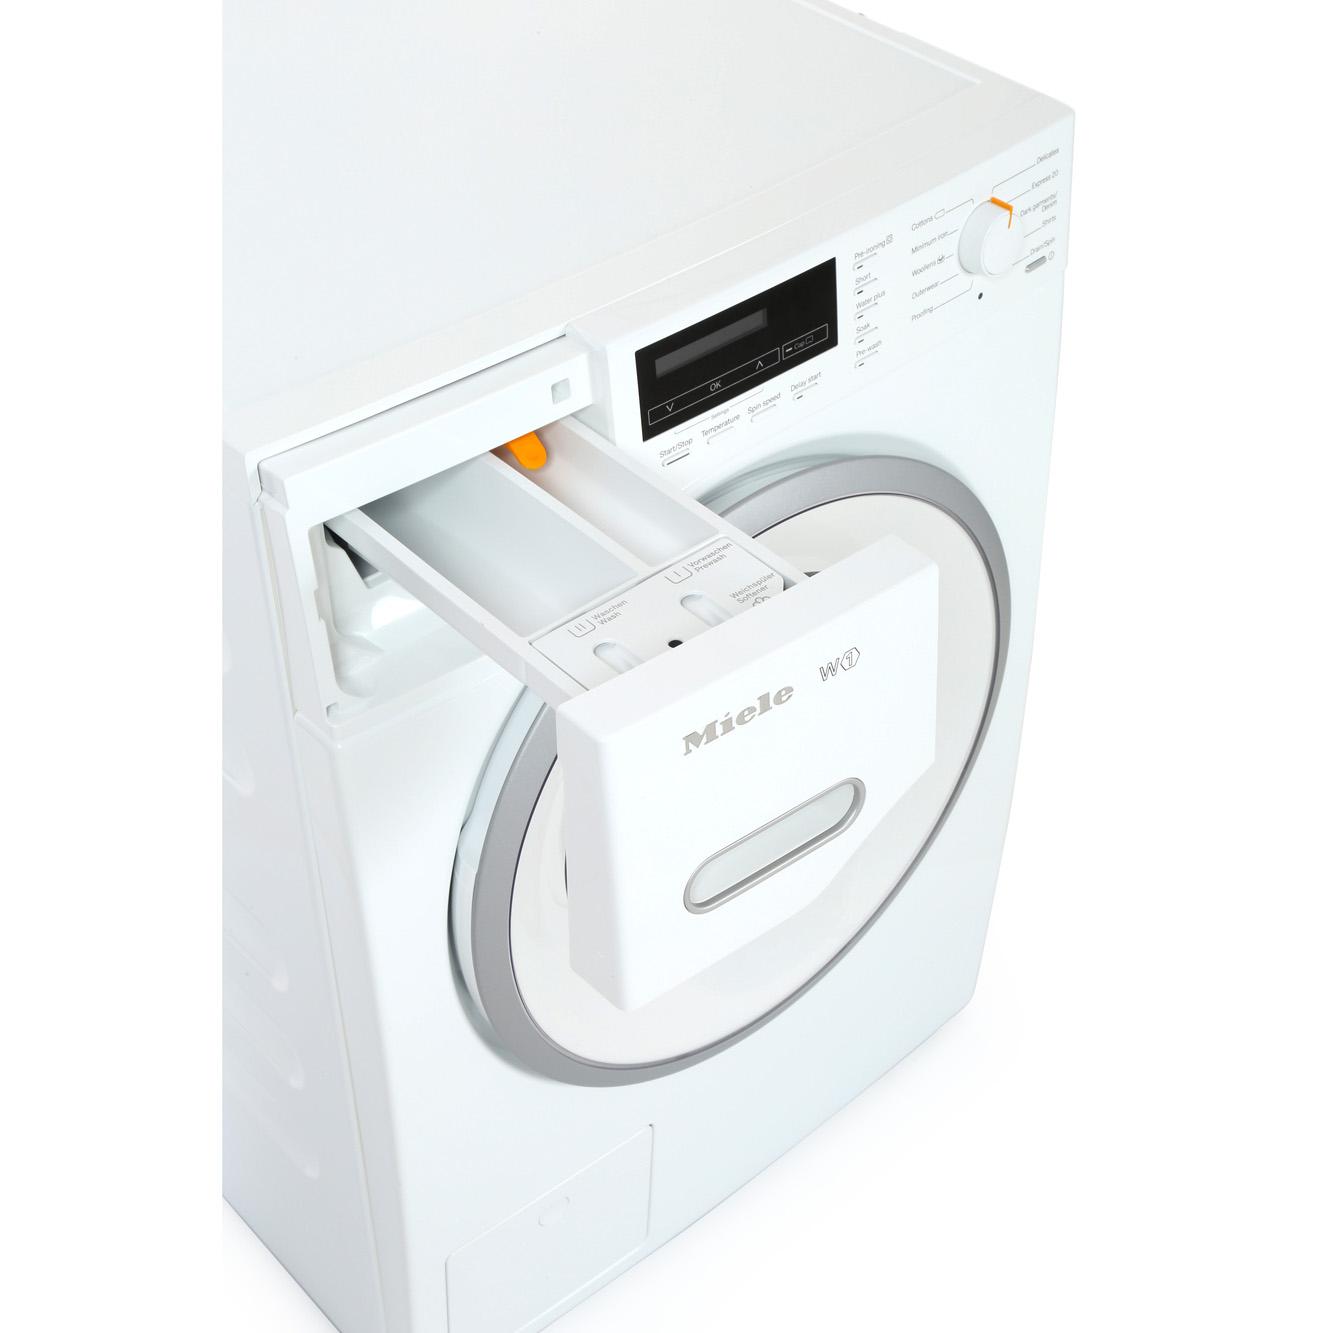 miele w1 washing machine manual